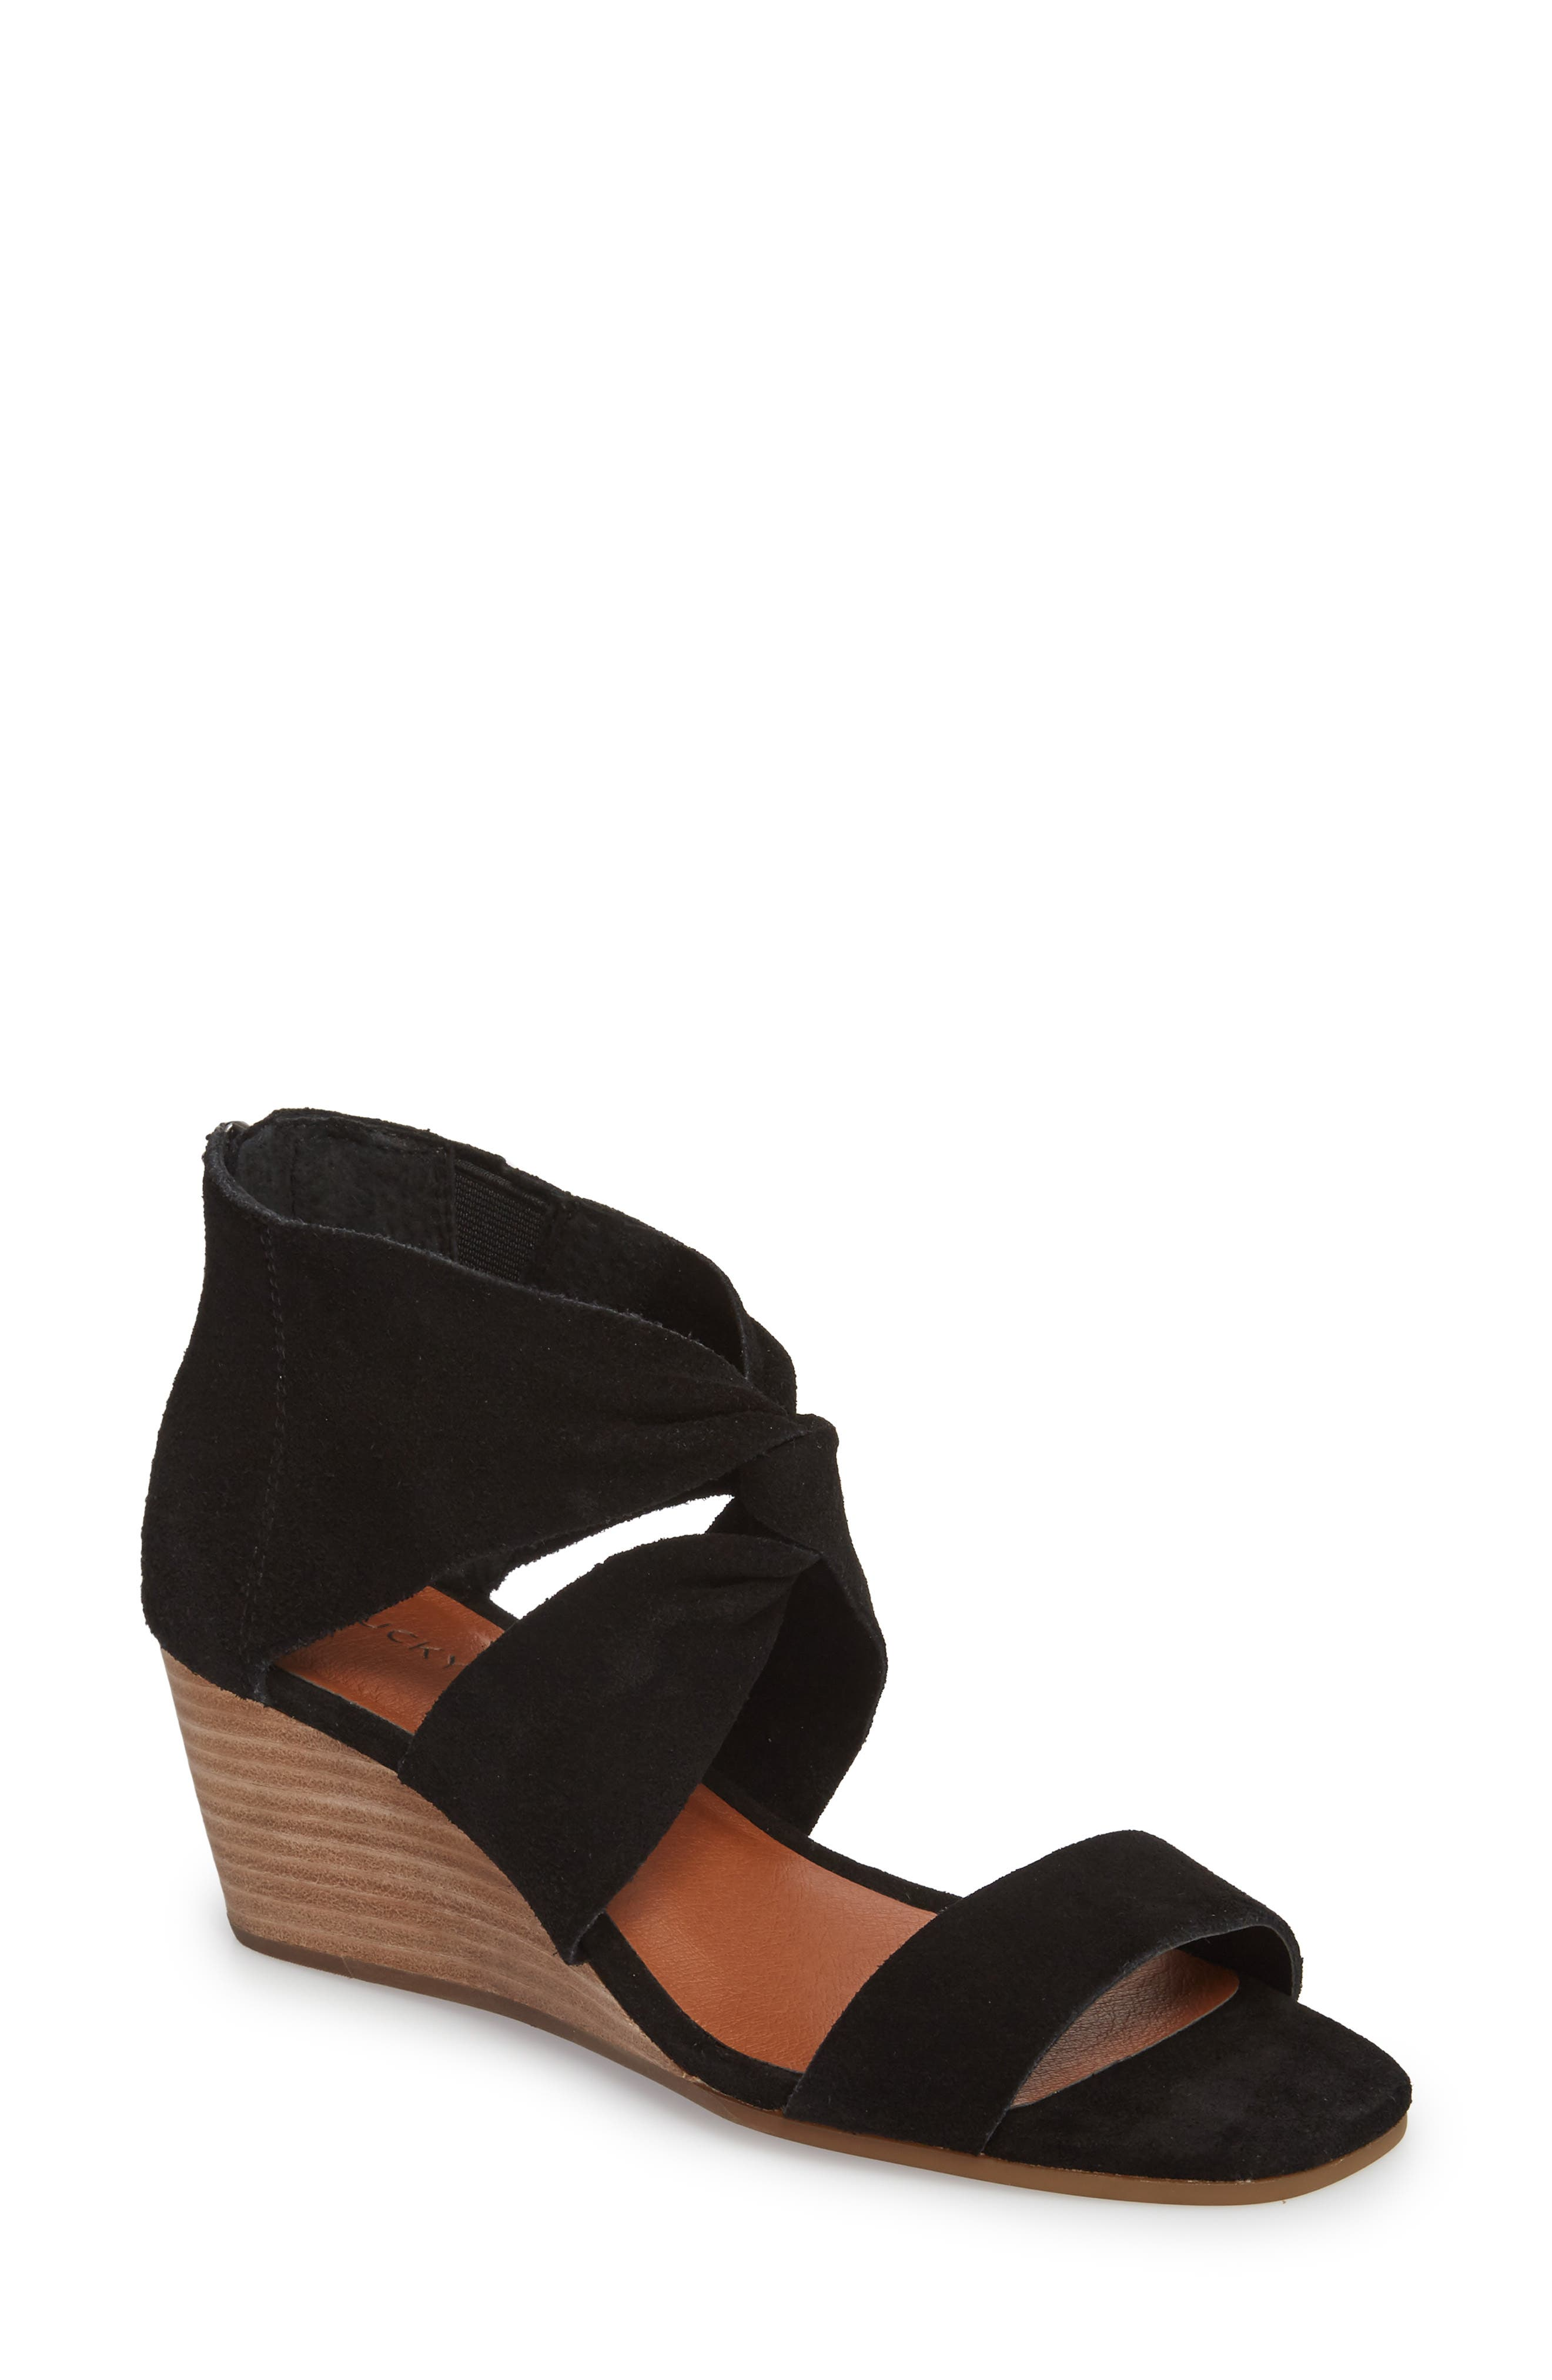 Main Image - Lucky Brand Tammanee Wedge Sandal (Women)